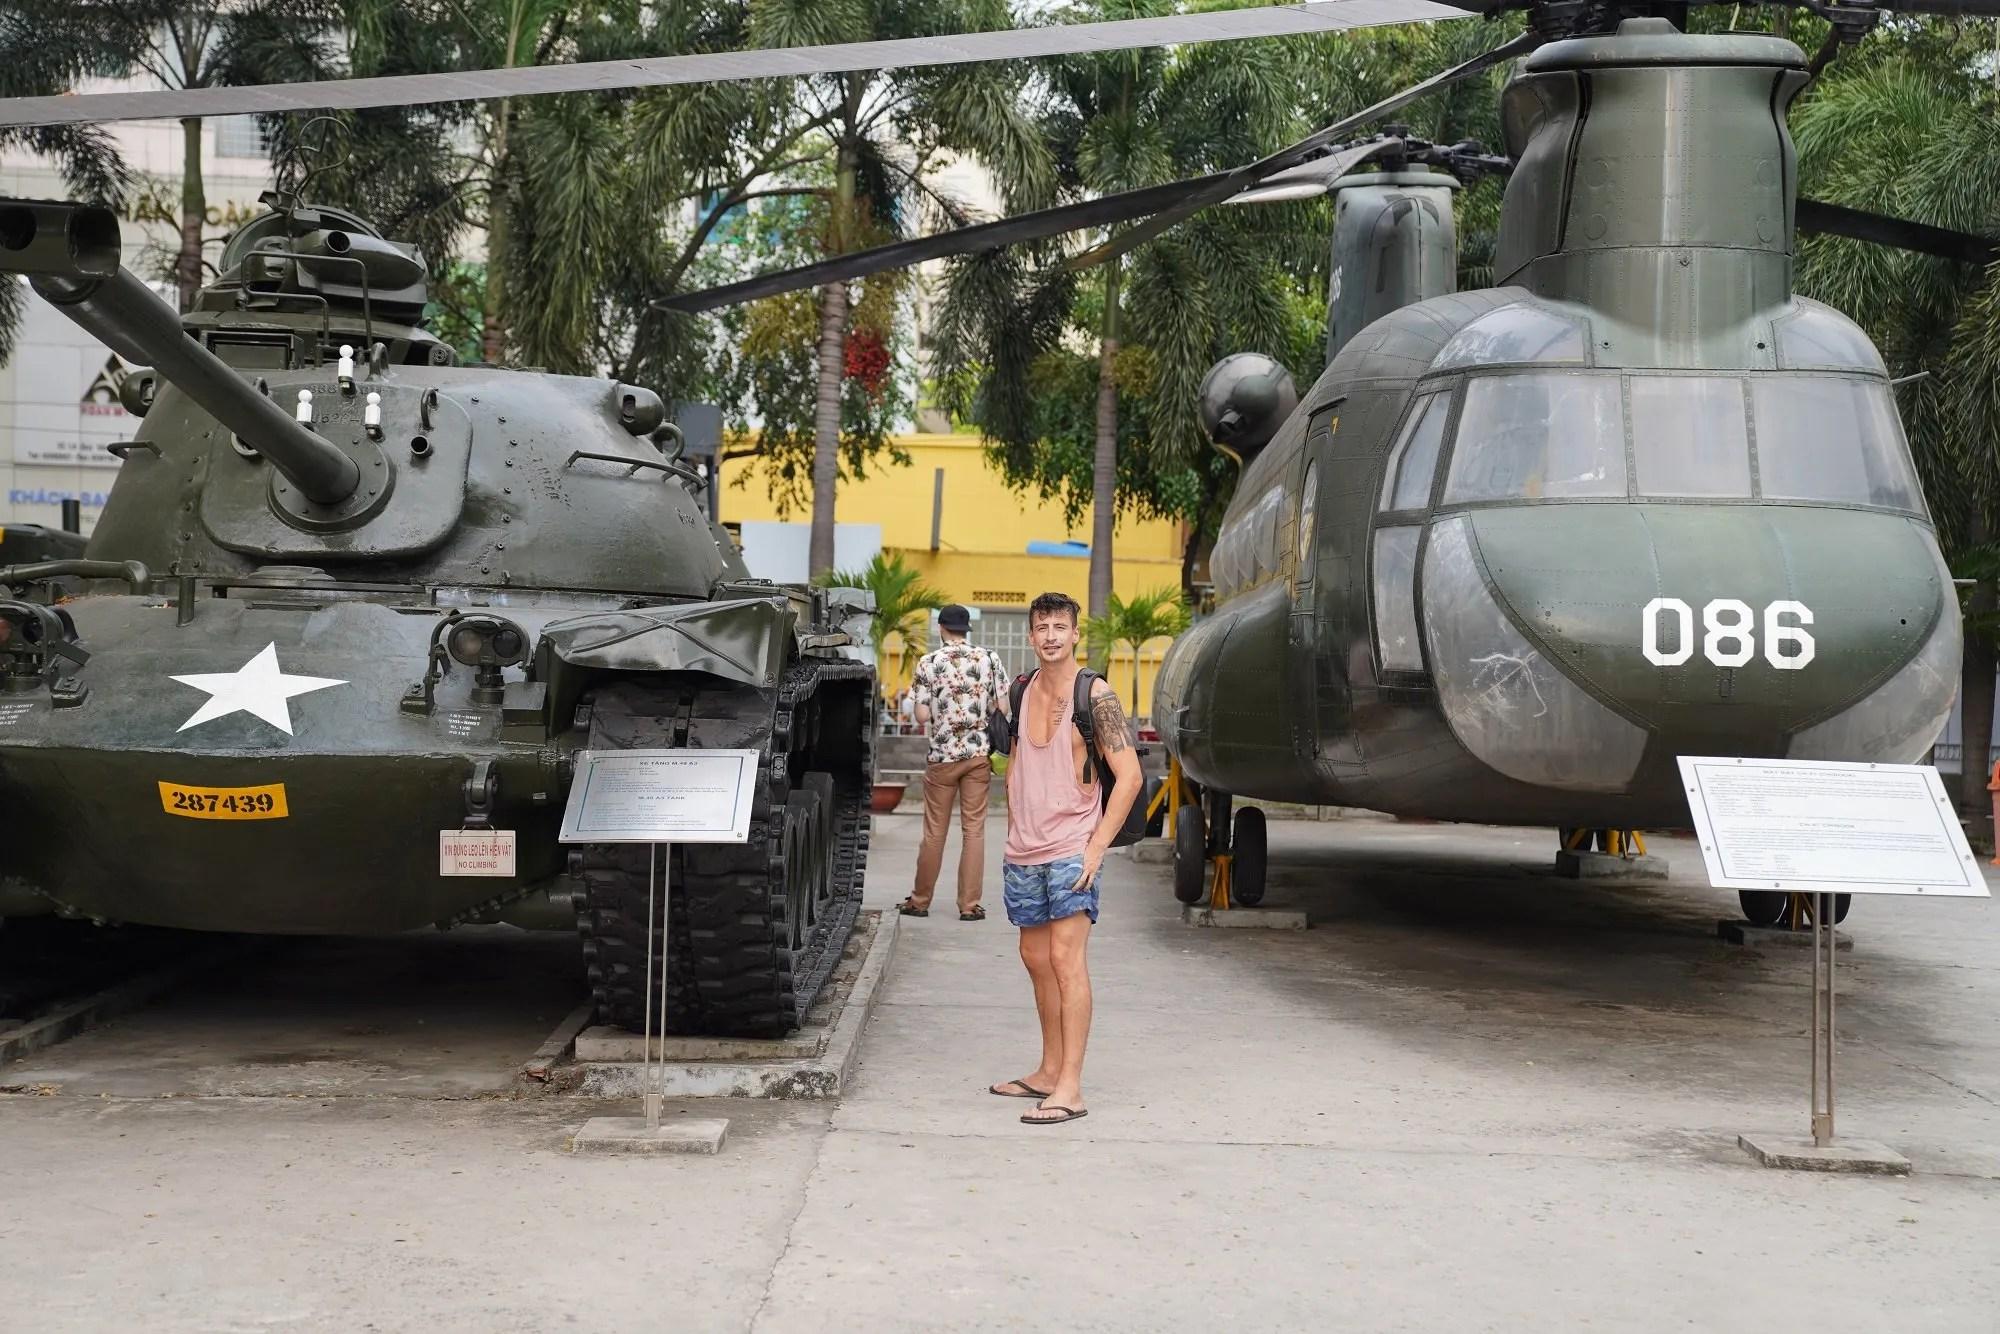 Catalin at the War Remnants Museum in Vietnam